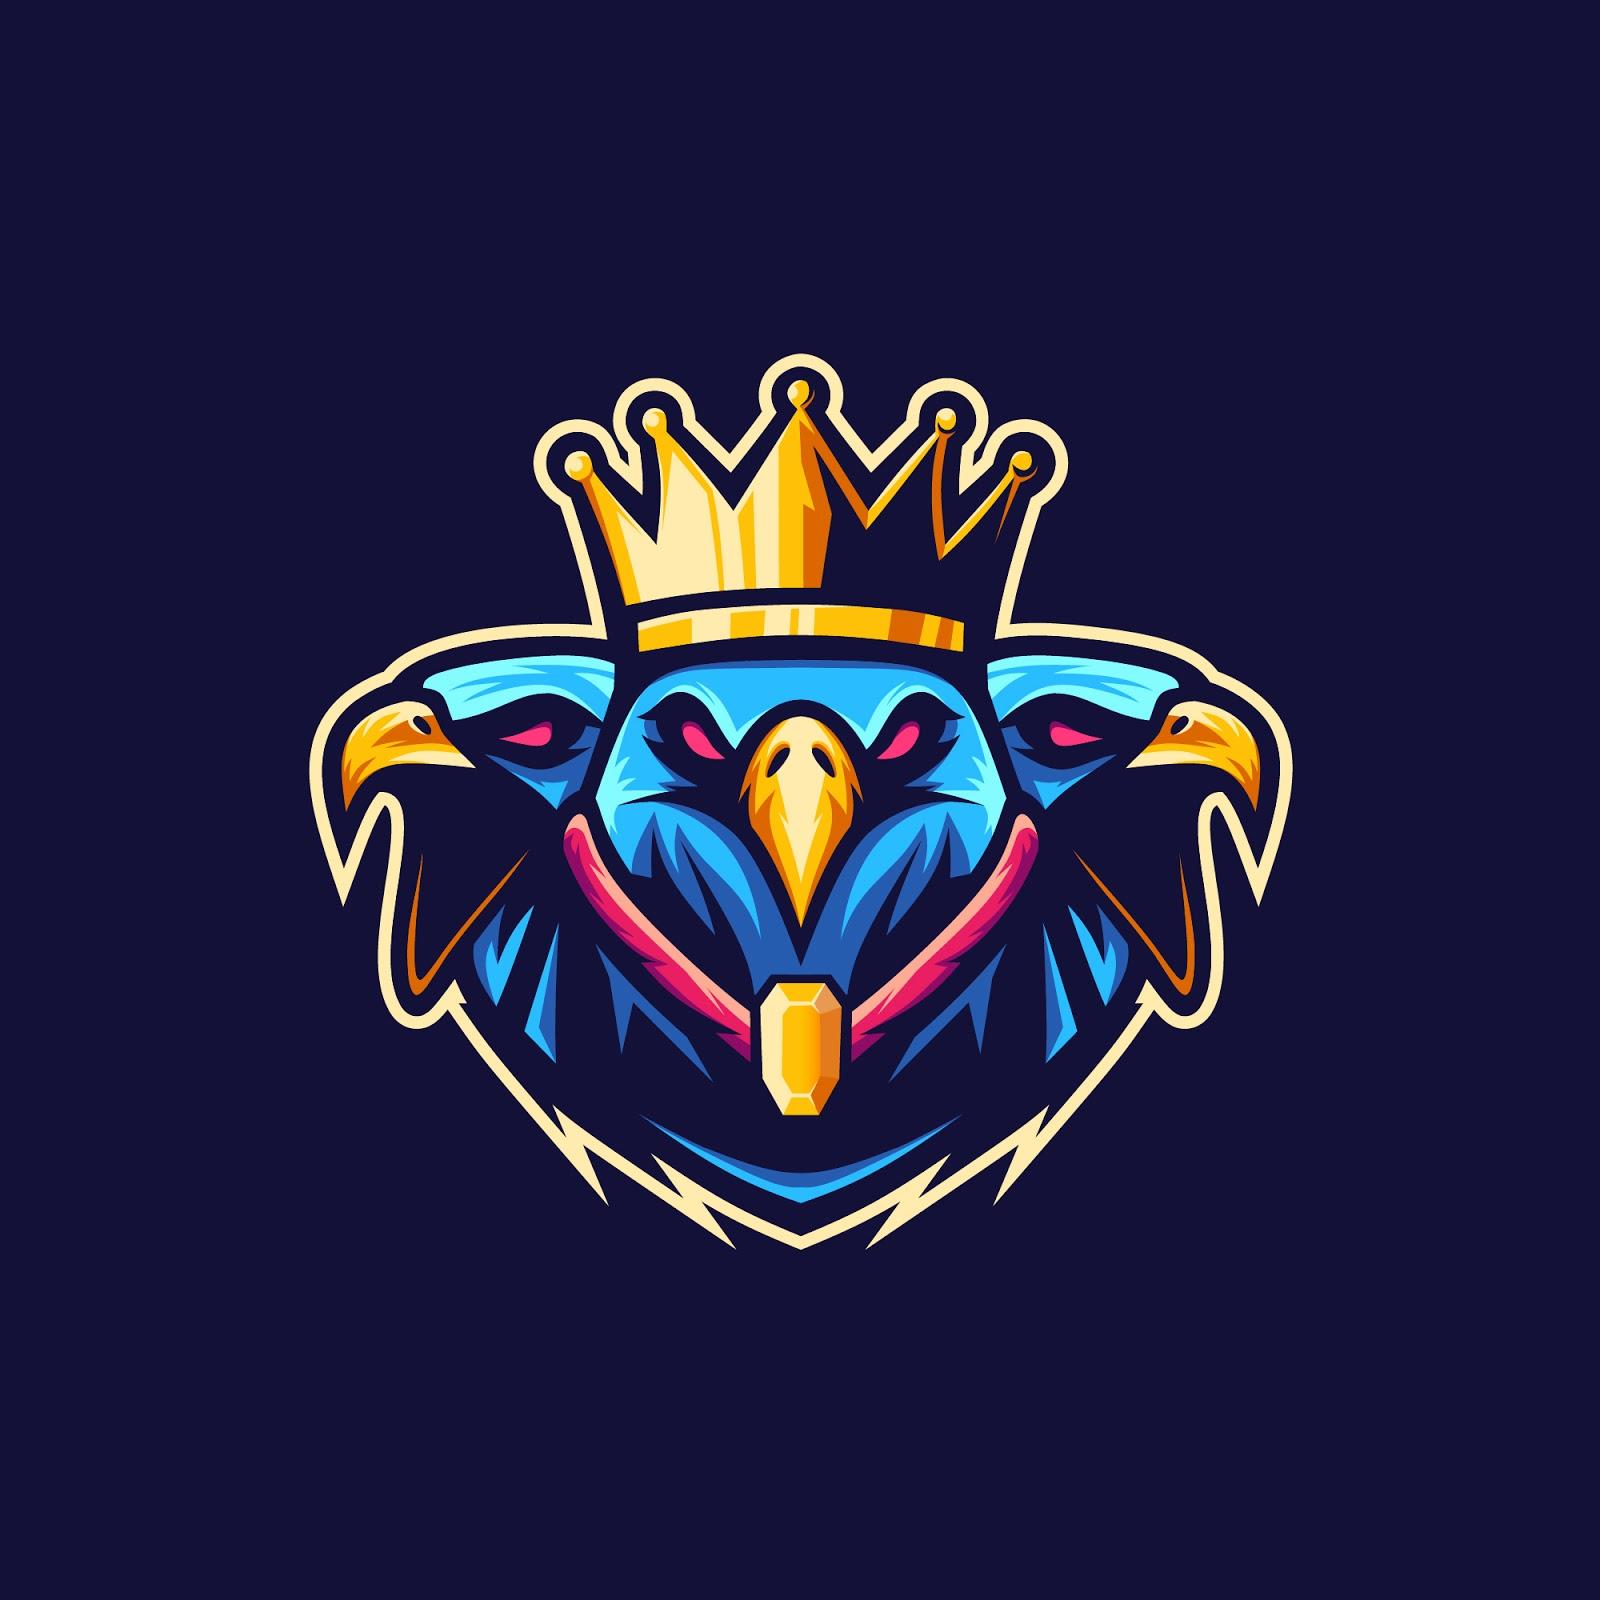 King Eagle Vetor Logo Illustration Free Download Vector CDR, AI, EPS and PNG Formats